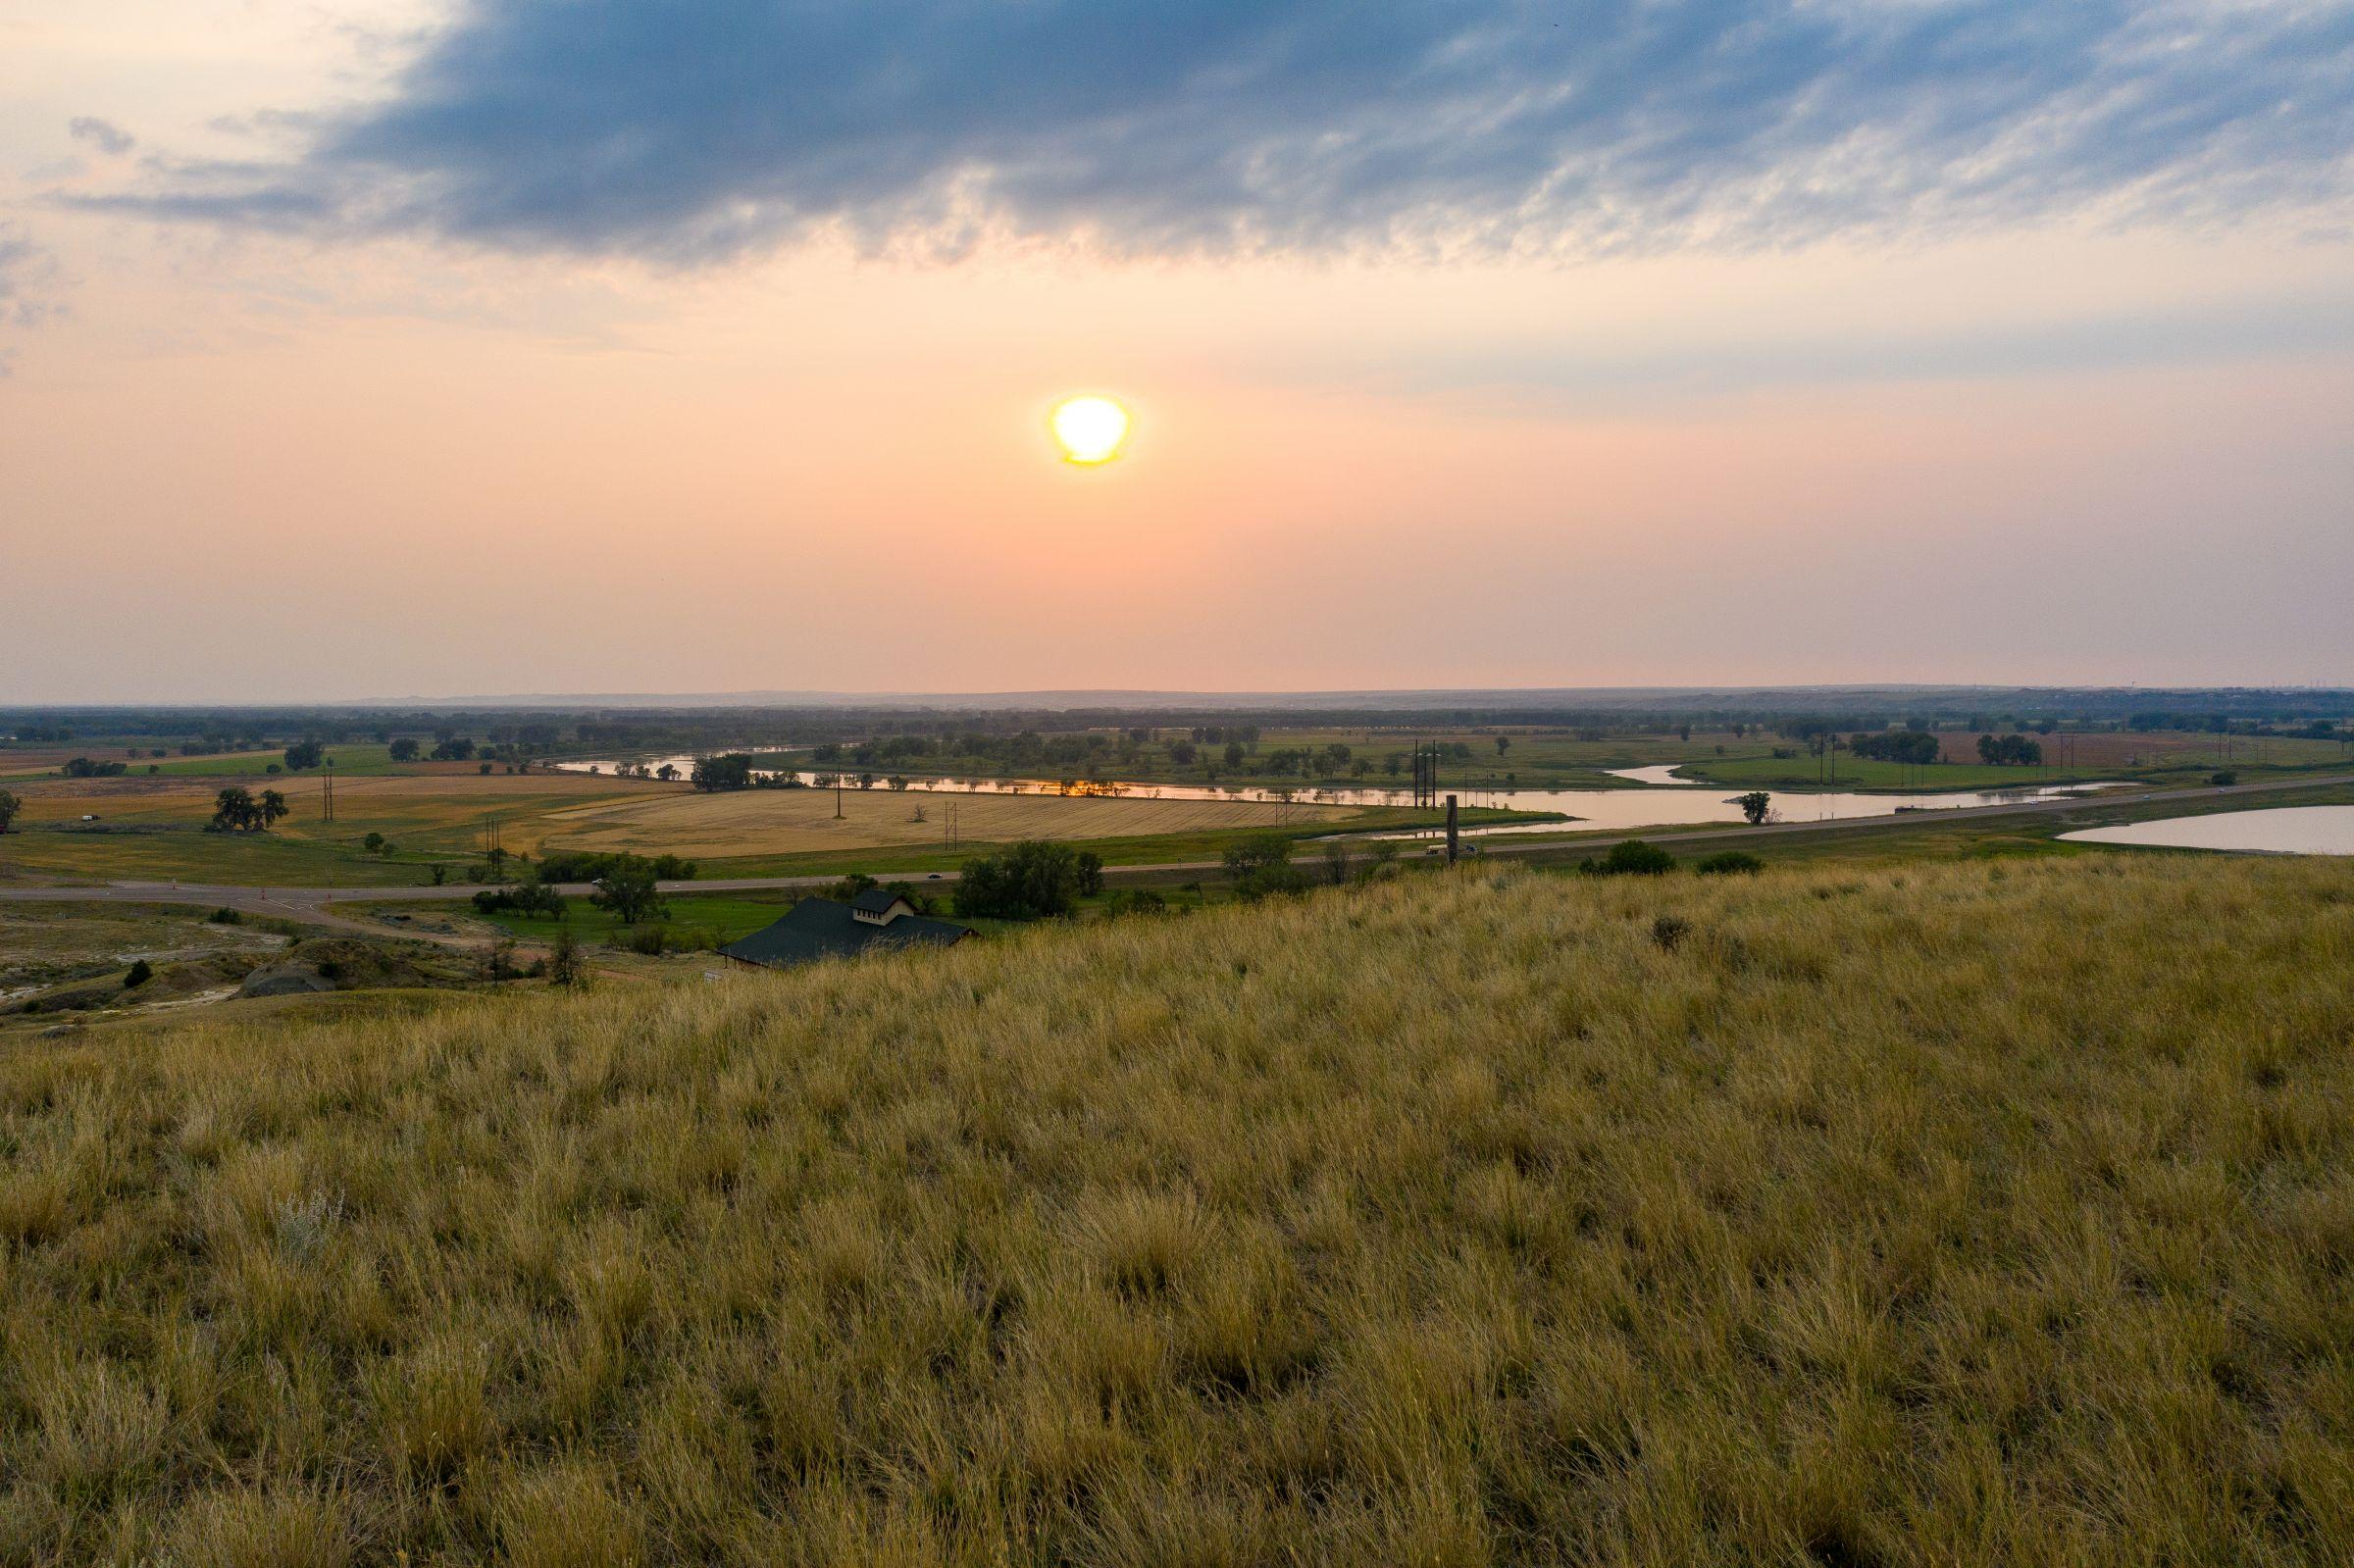 auctions-land-mckenzie-county-north-dakota-270-acres-listing-number-15735-3-2021-09-09-211358.jpeg